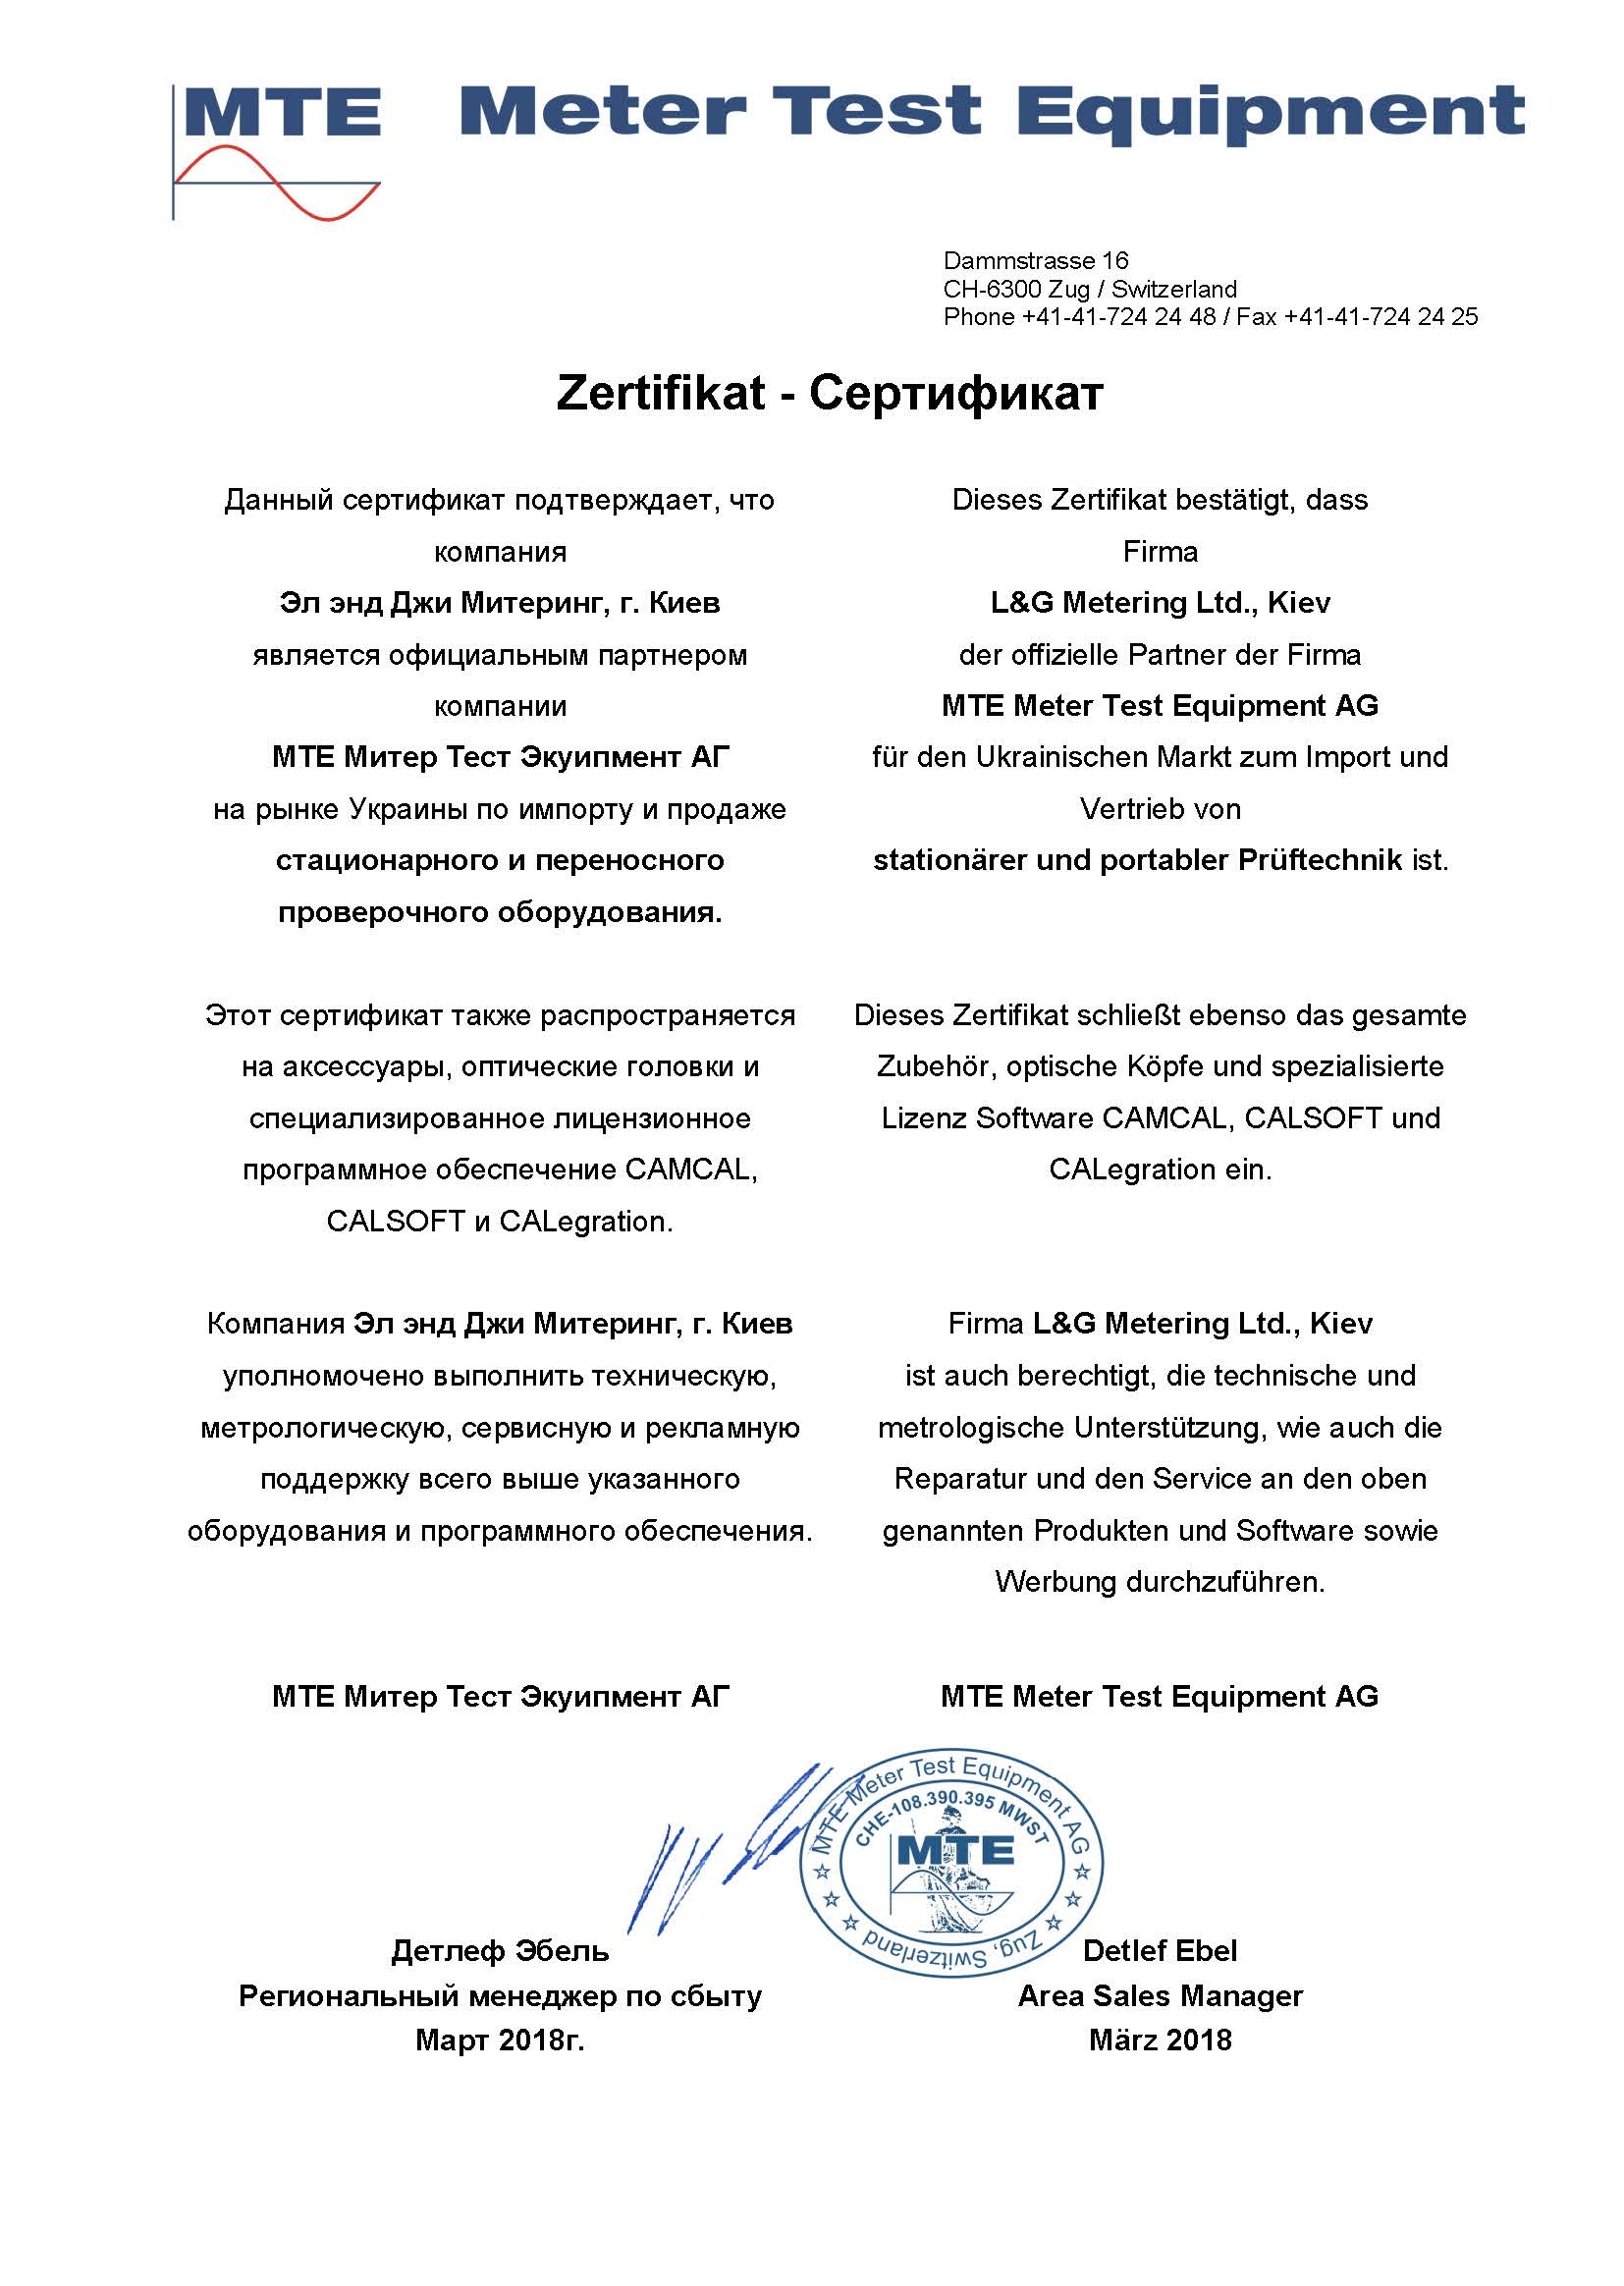 Сертификат MTE